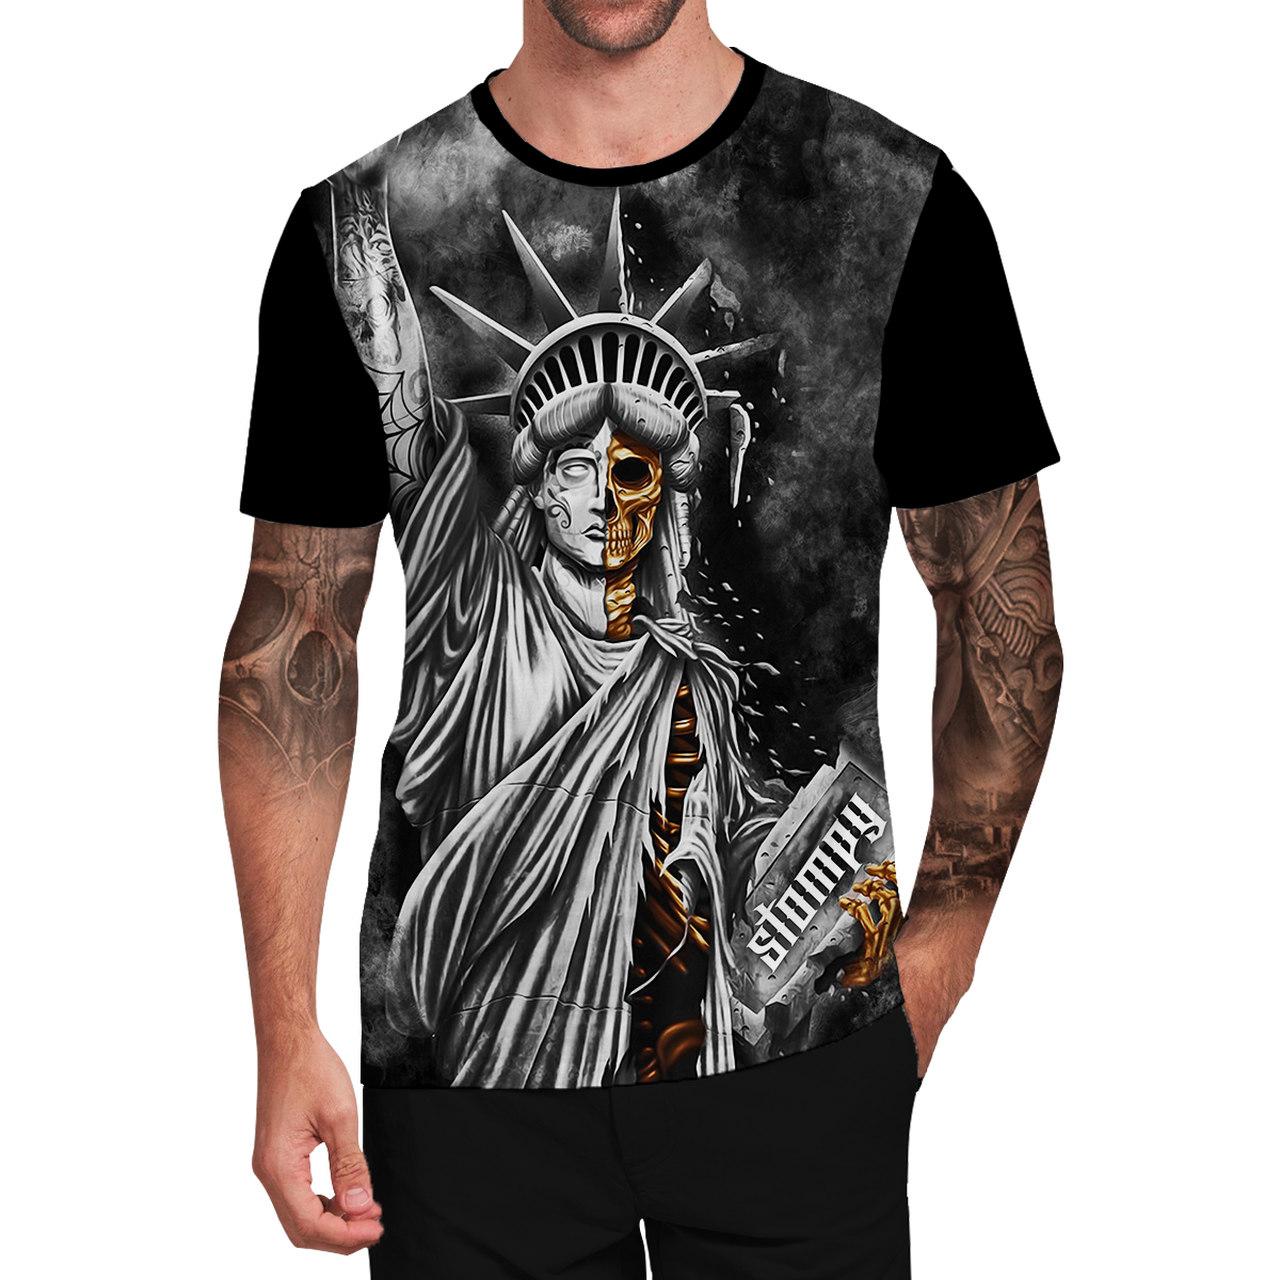 Stompy Camiseta Tattoo Tatuagem Caveira Skull 50